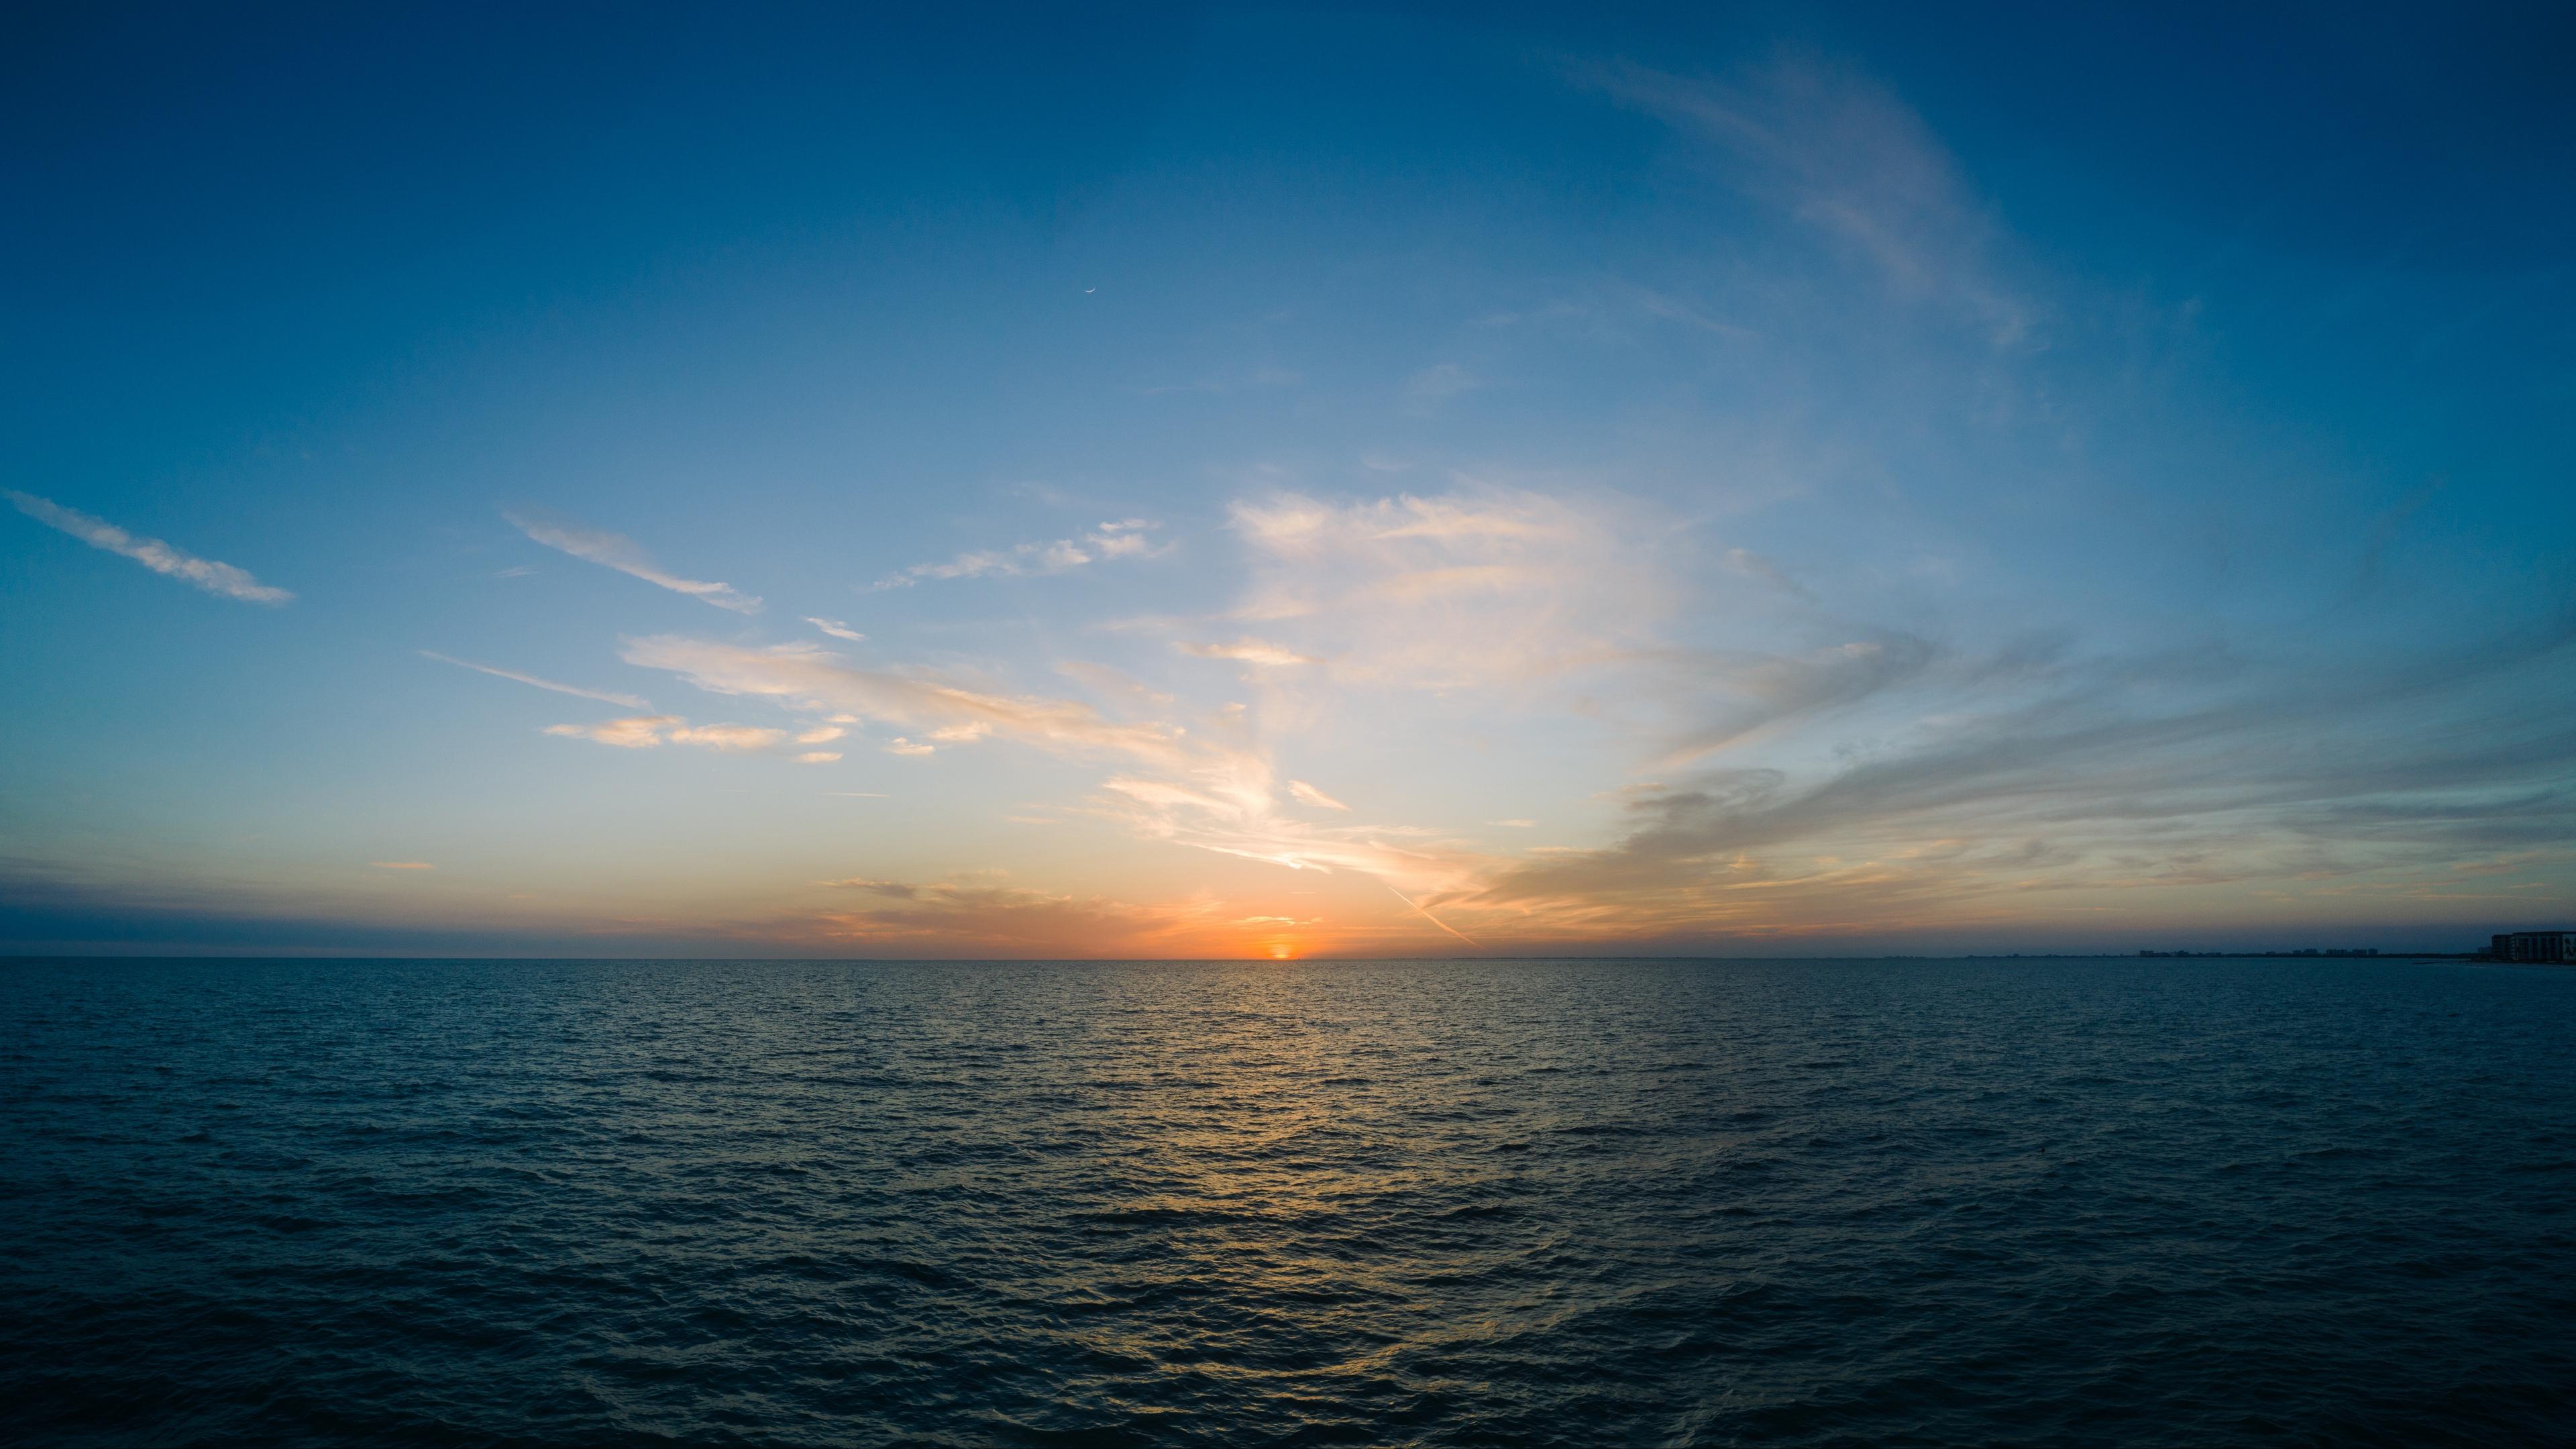 sea horizon sunset clouds sky 4k 1541116681 - sea, horizon, sunset, clouds, sky 4k - sunset, Sea, Horizon